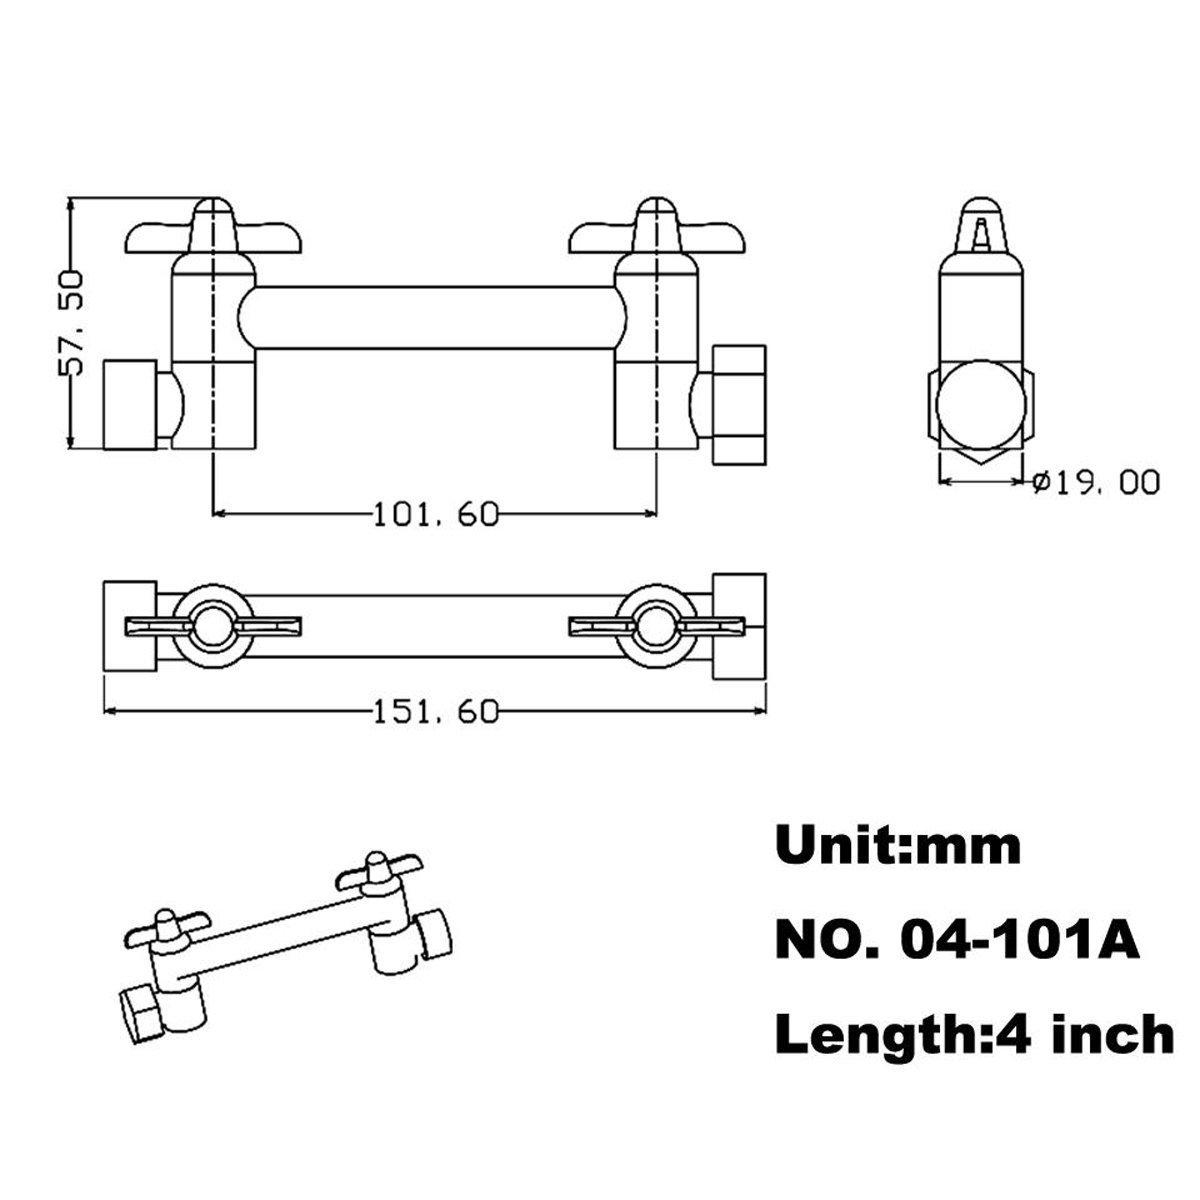 HANEBATH 4 Inch Brass Shower Arm Shower Head Combo Adjustable Height Arm Mount,Chrome by HANEBATH (Image #2)